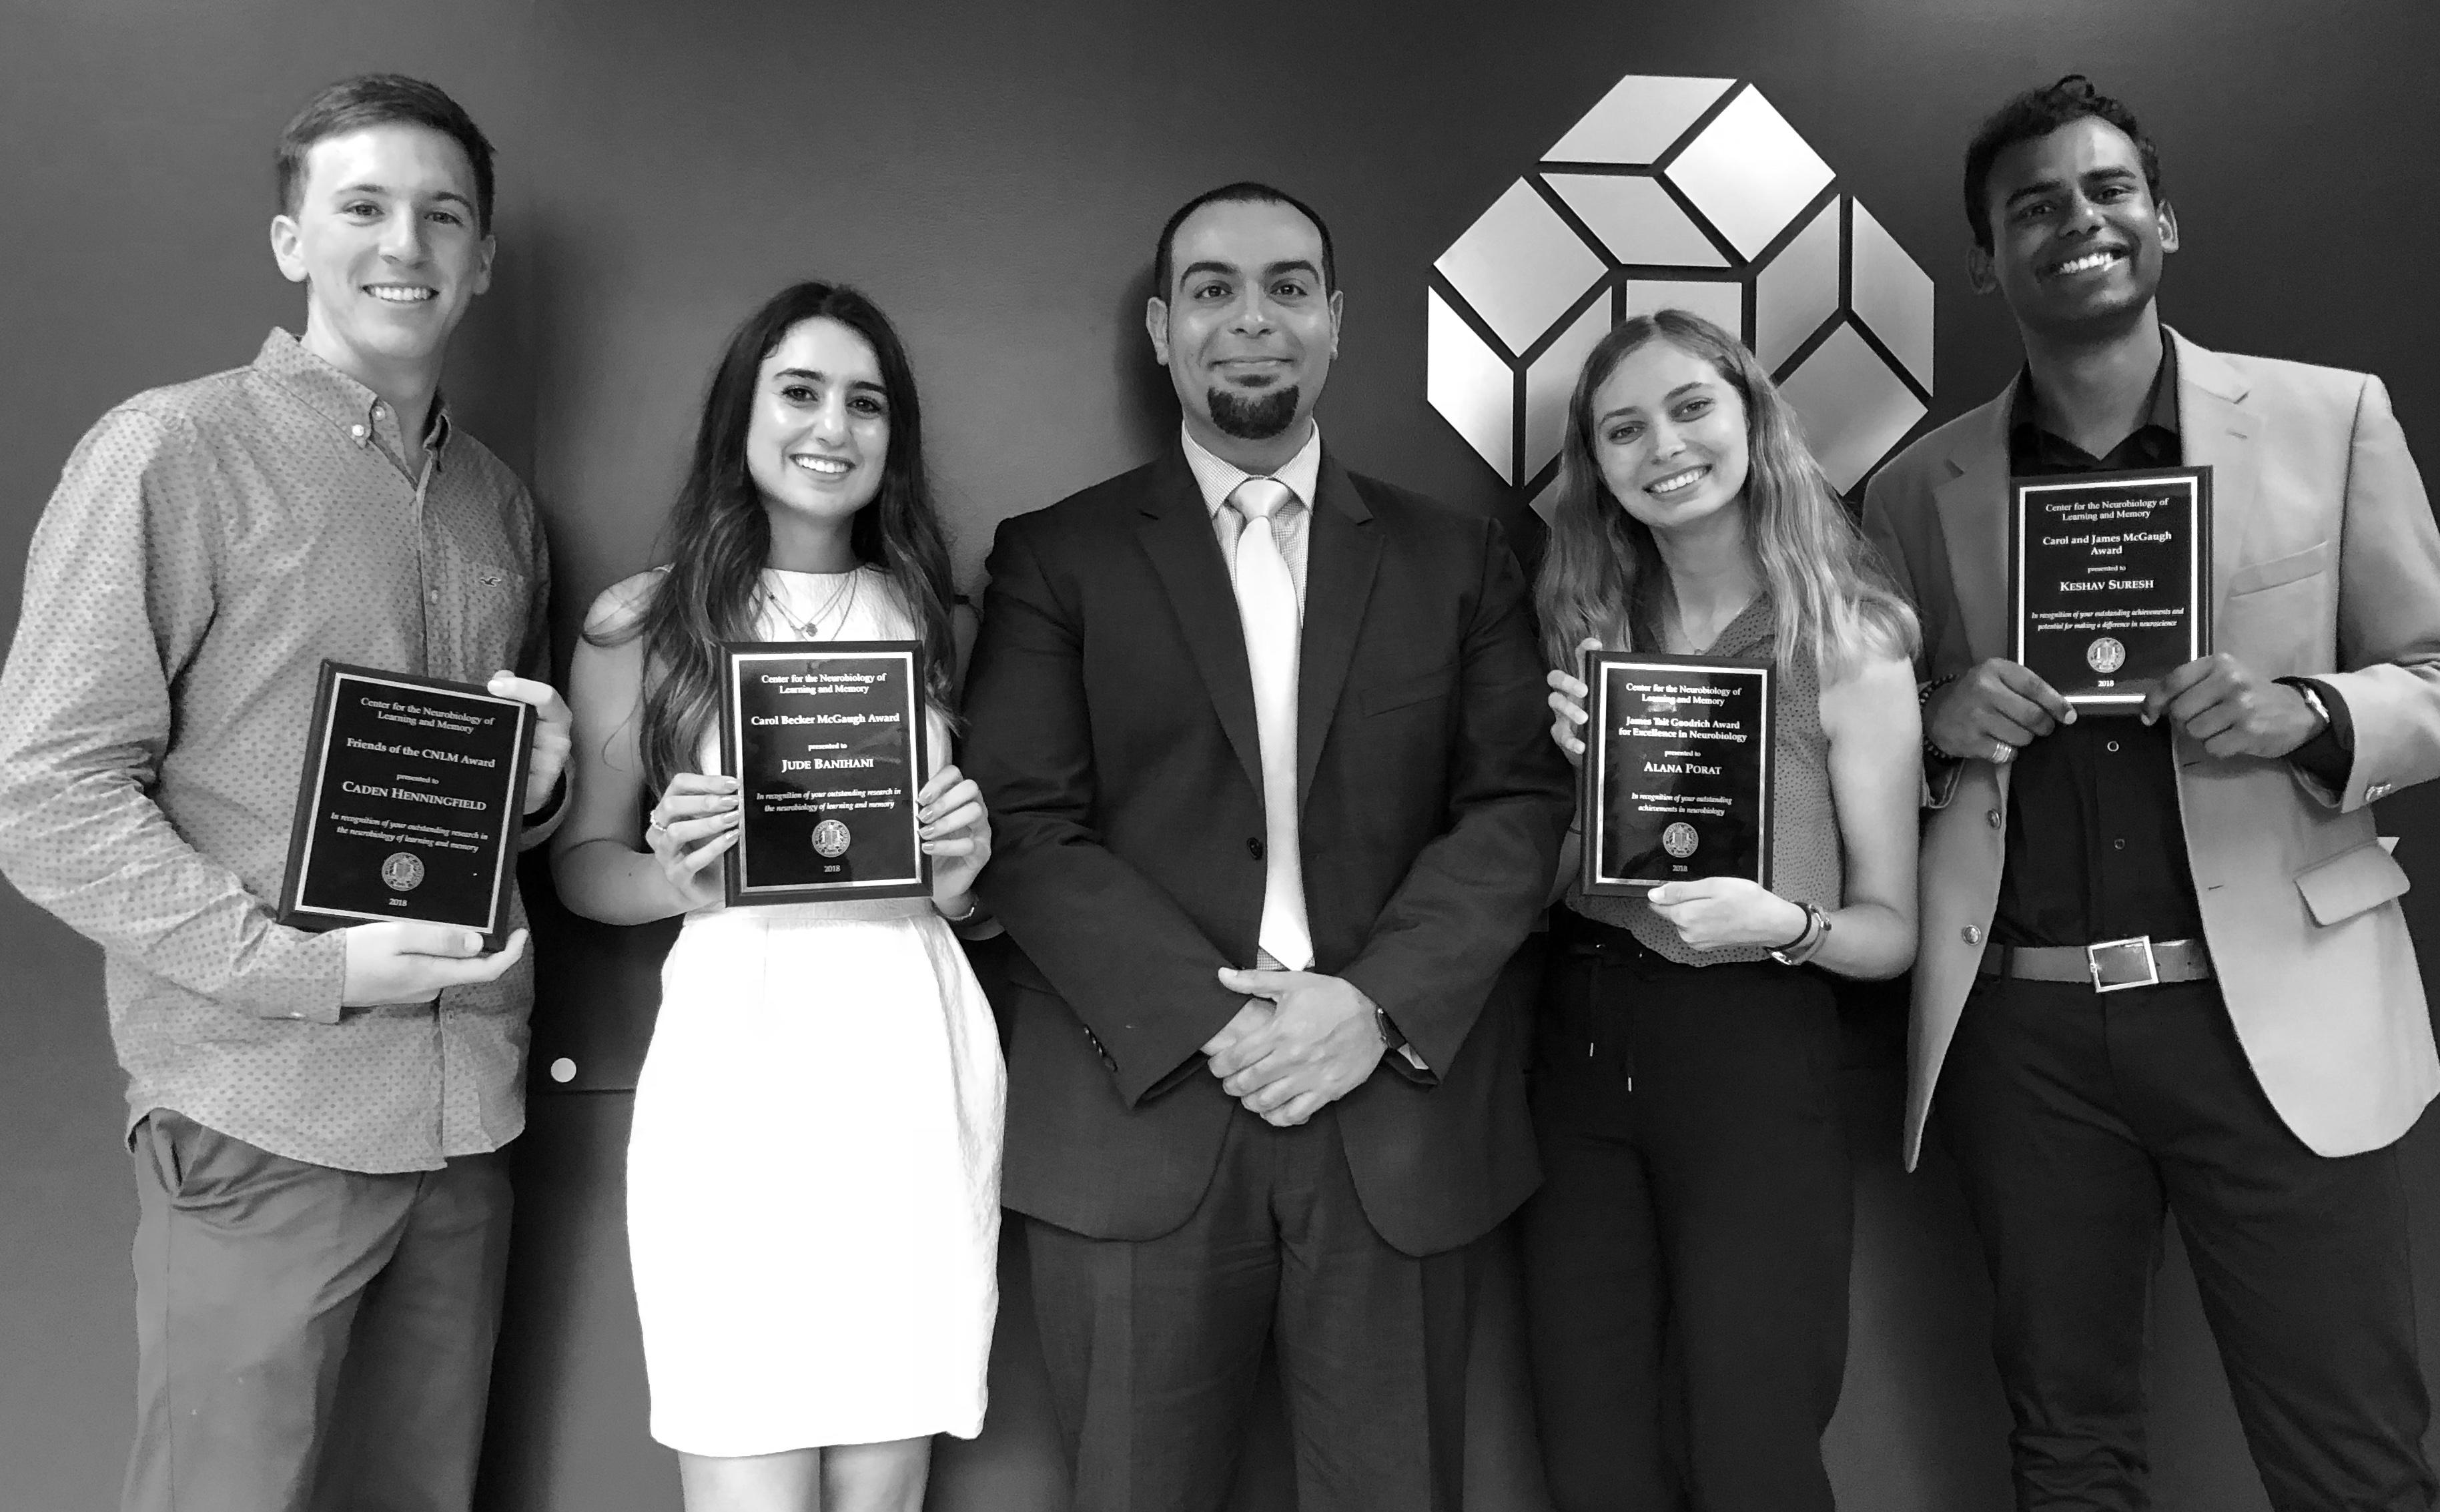 Undergraduate Award Recipients Caden Henningfield, Jude Banihani, Alana Porat and Keshav Suresh pose with CNLM Director Dr. Michael Yassa